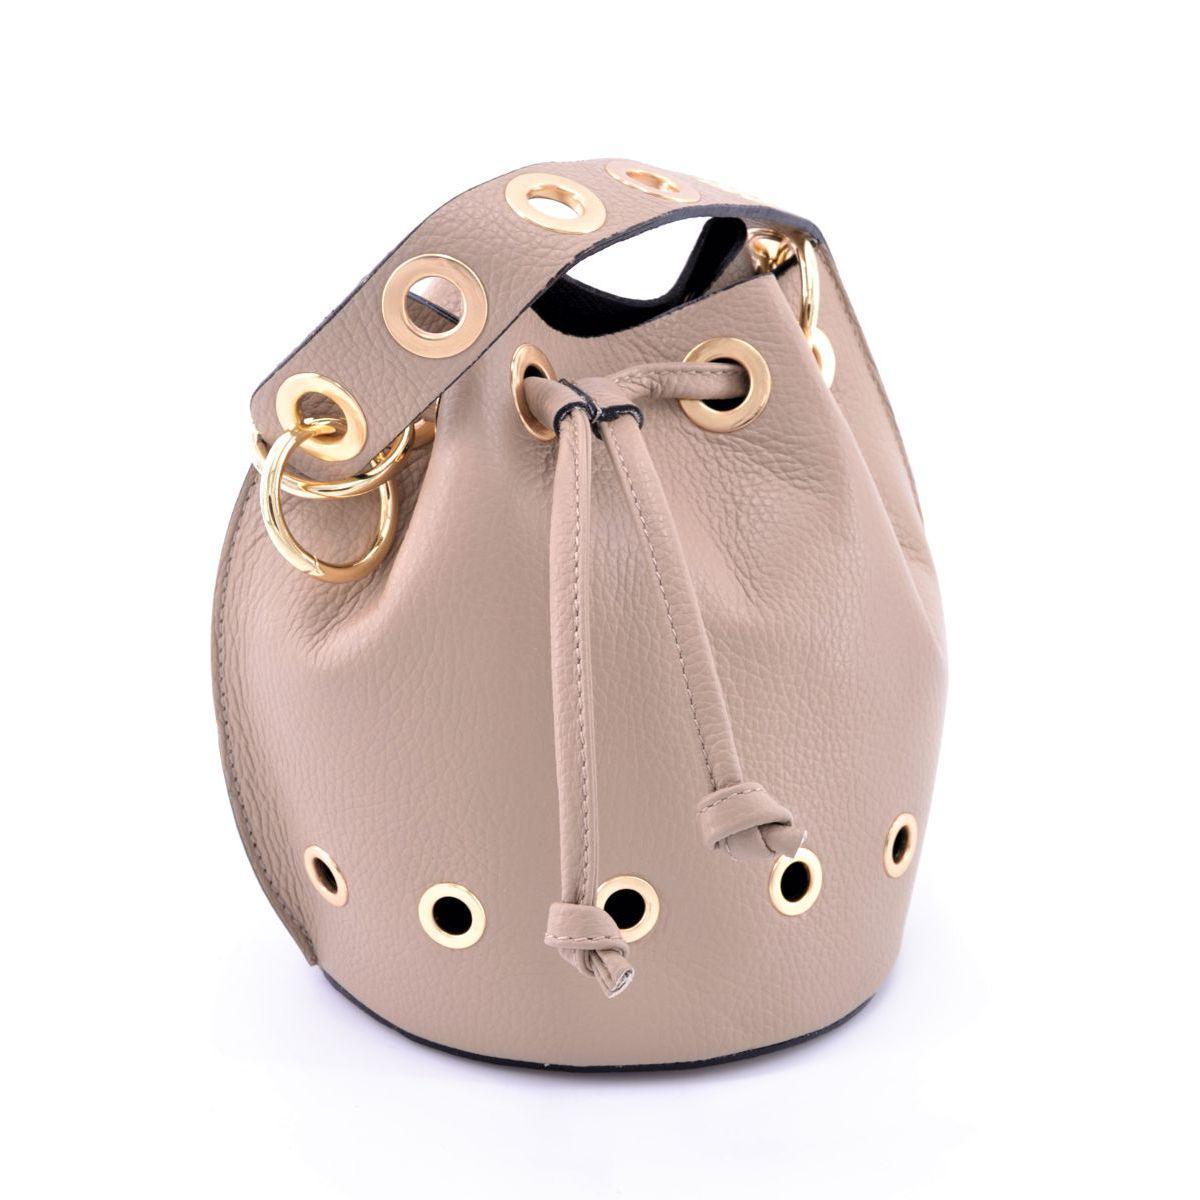 Mini leather bucket with shoulder strap Beige BRASS Workshop